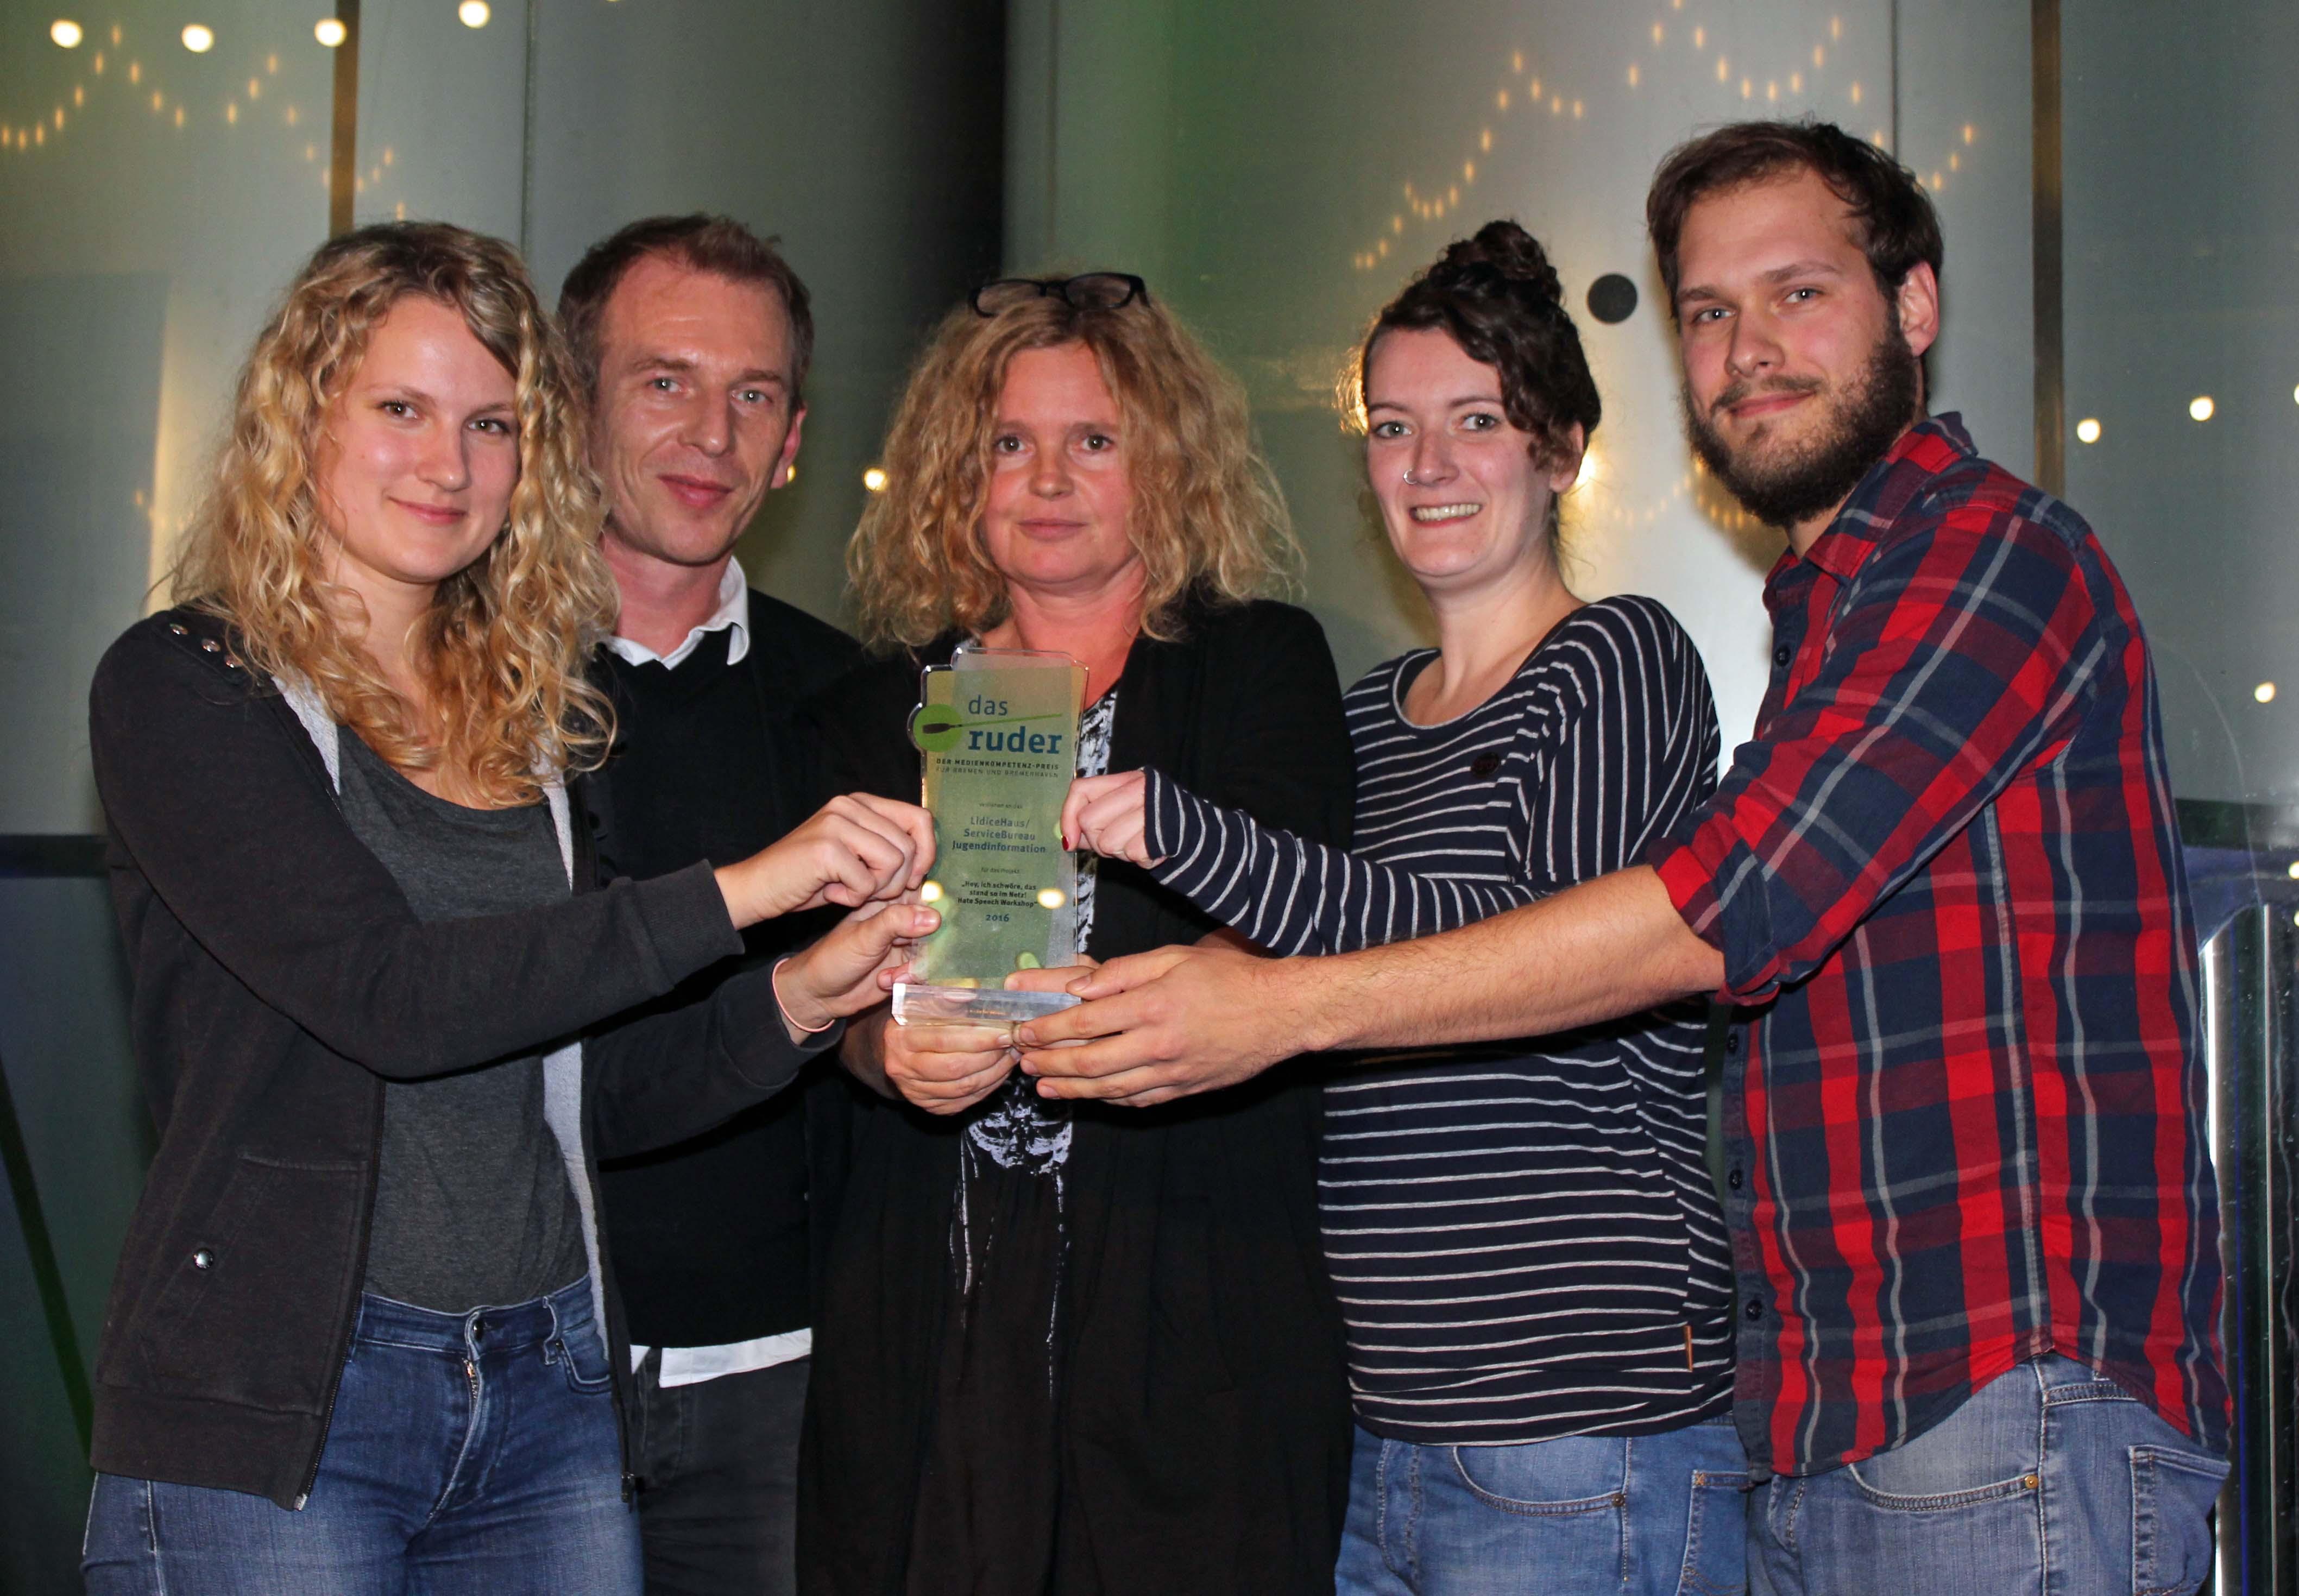 Preisträger Das Ruder 2016 Service Bureau Jugendinformation